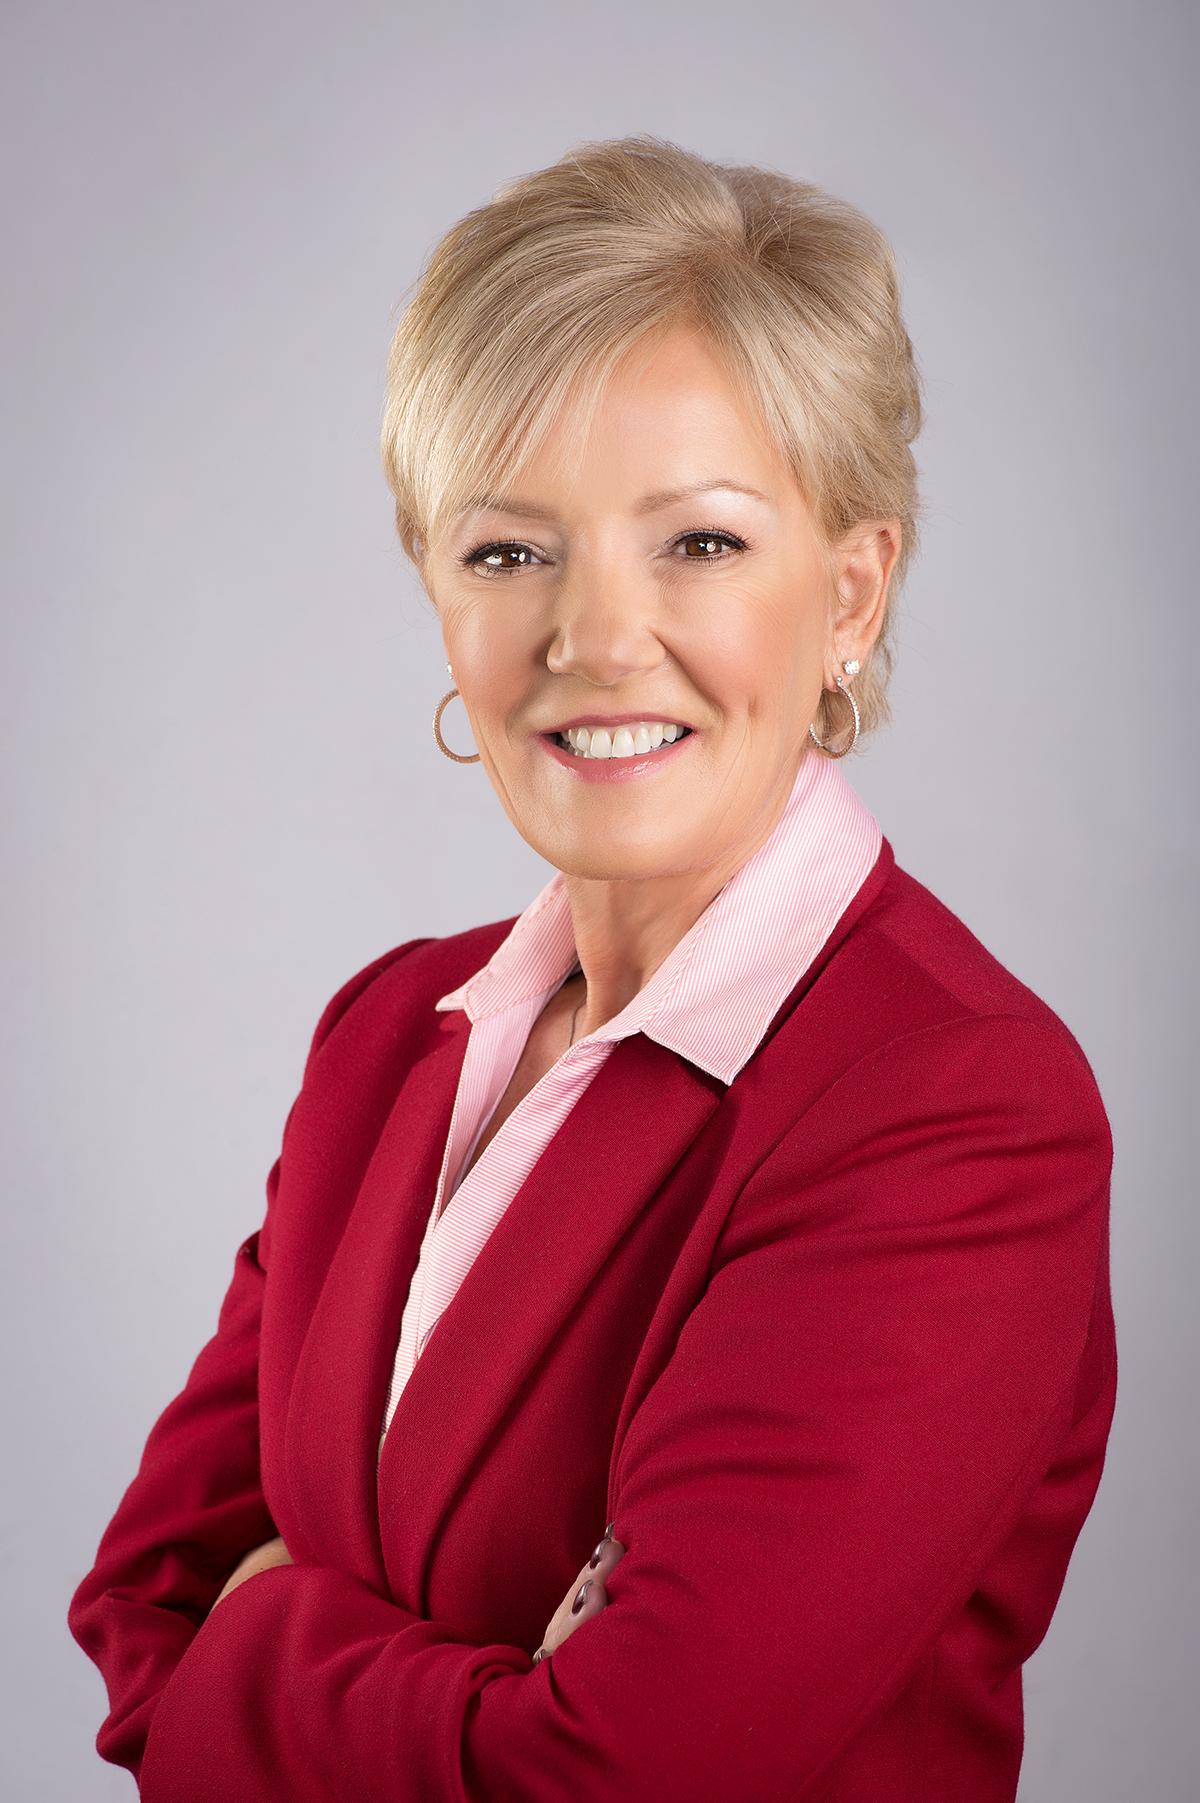 Sue McFadden